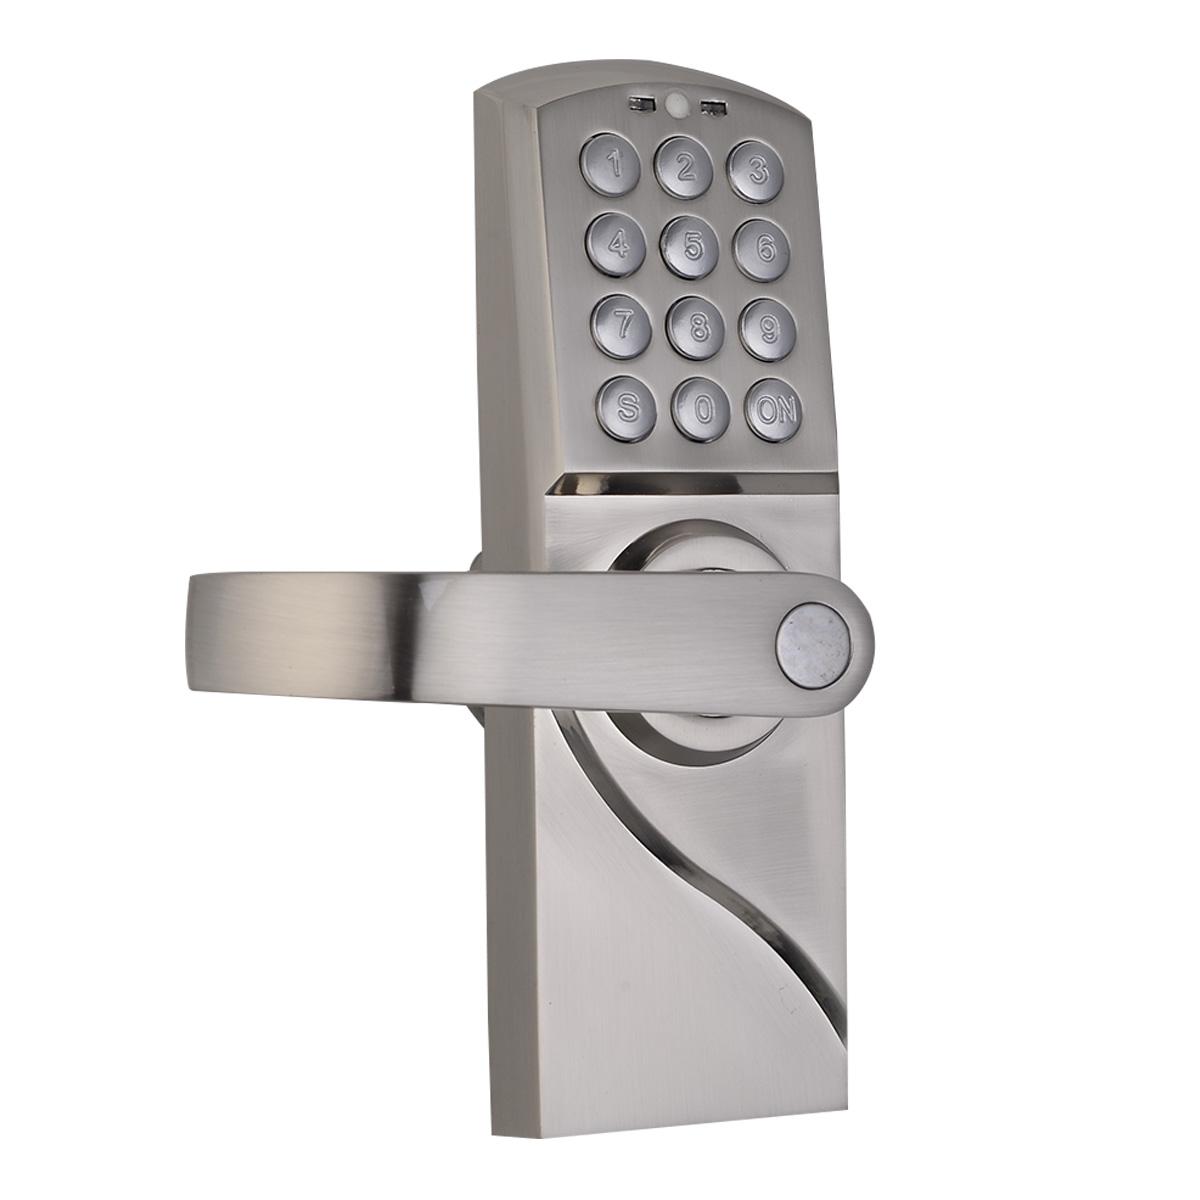 keypad door knob photo - 1